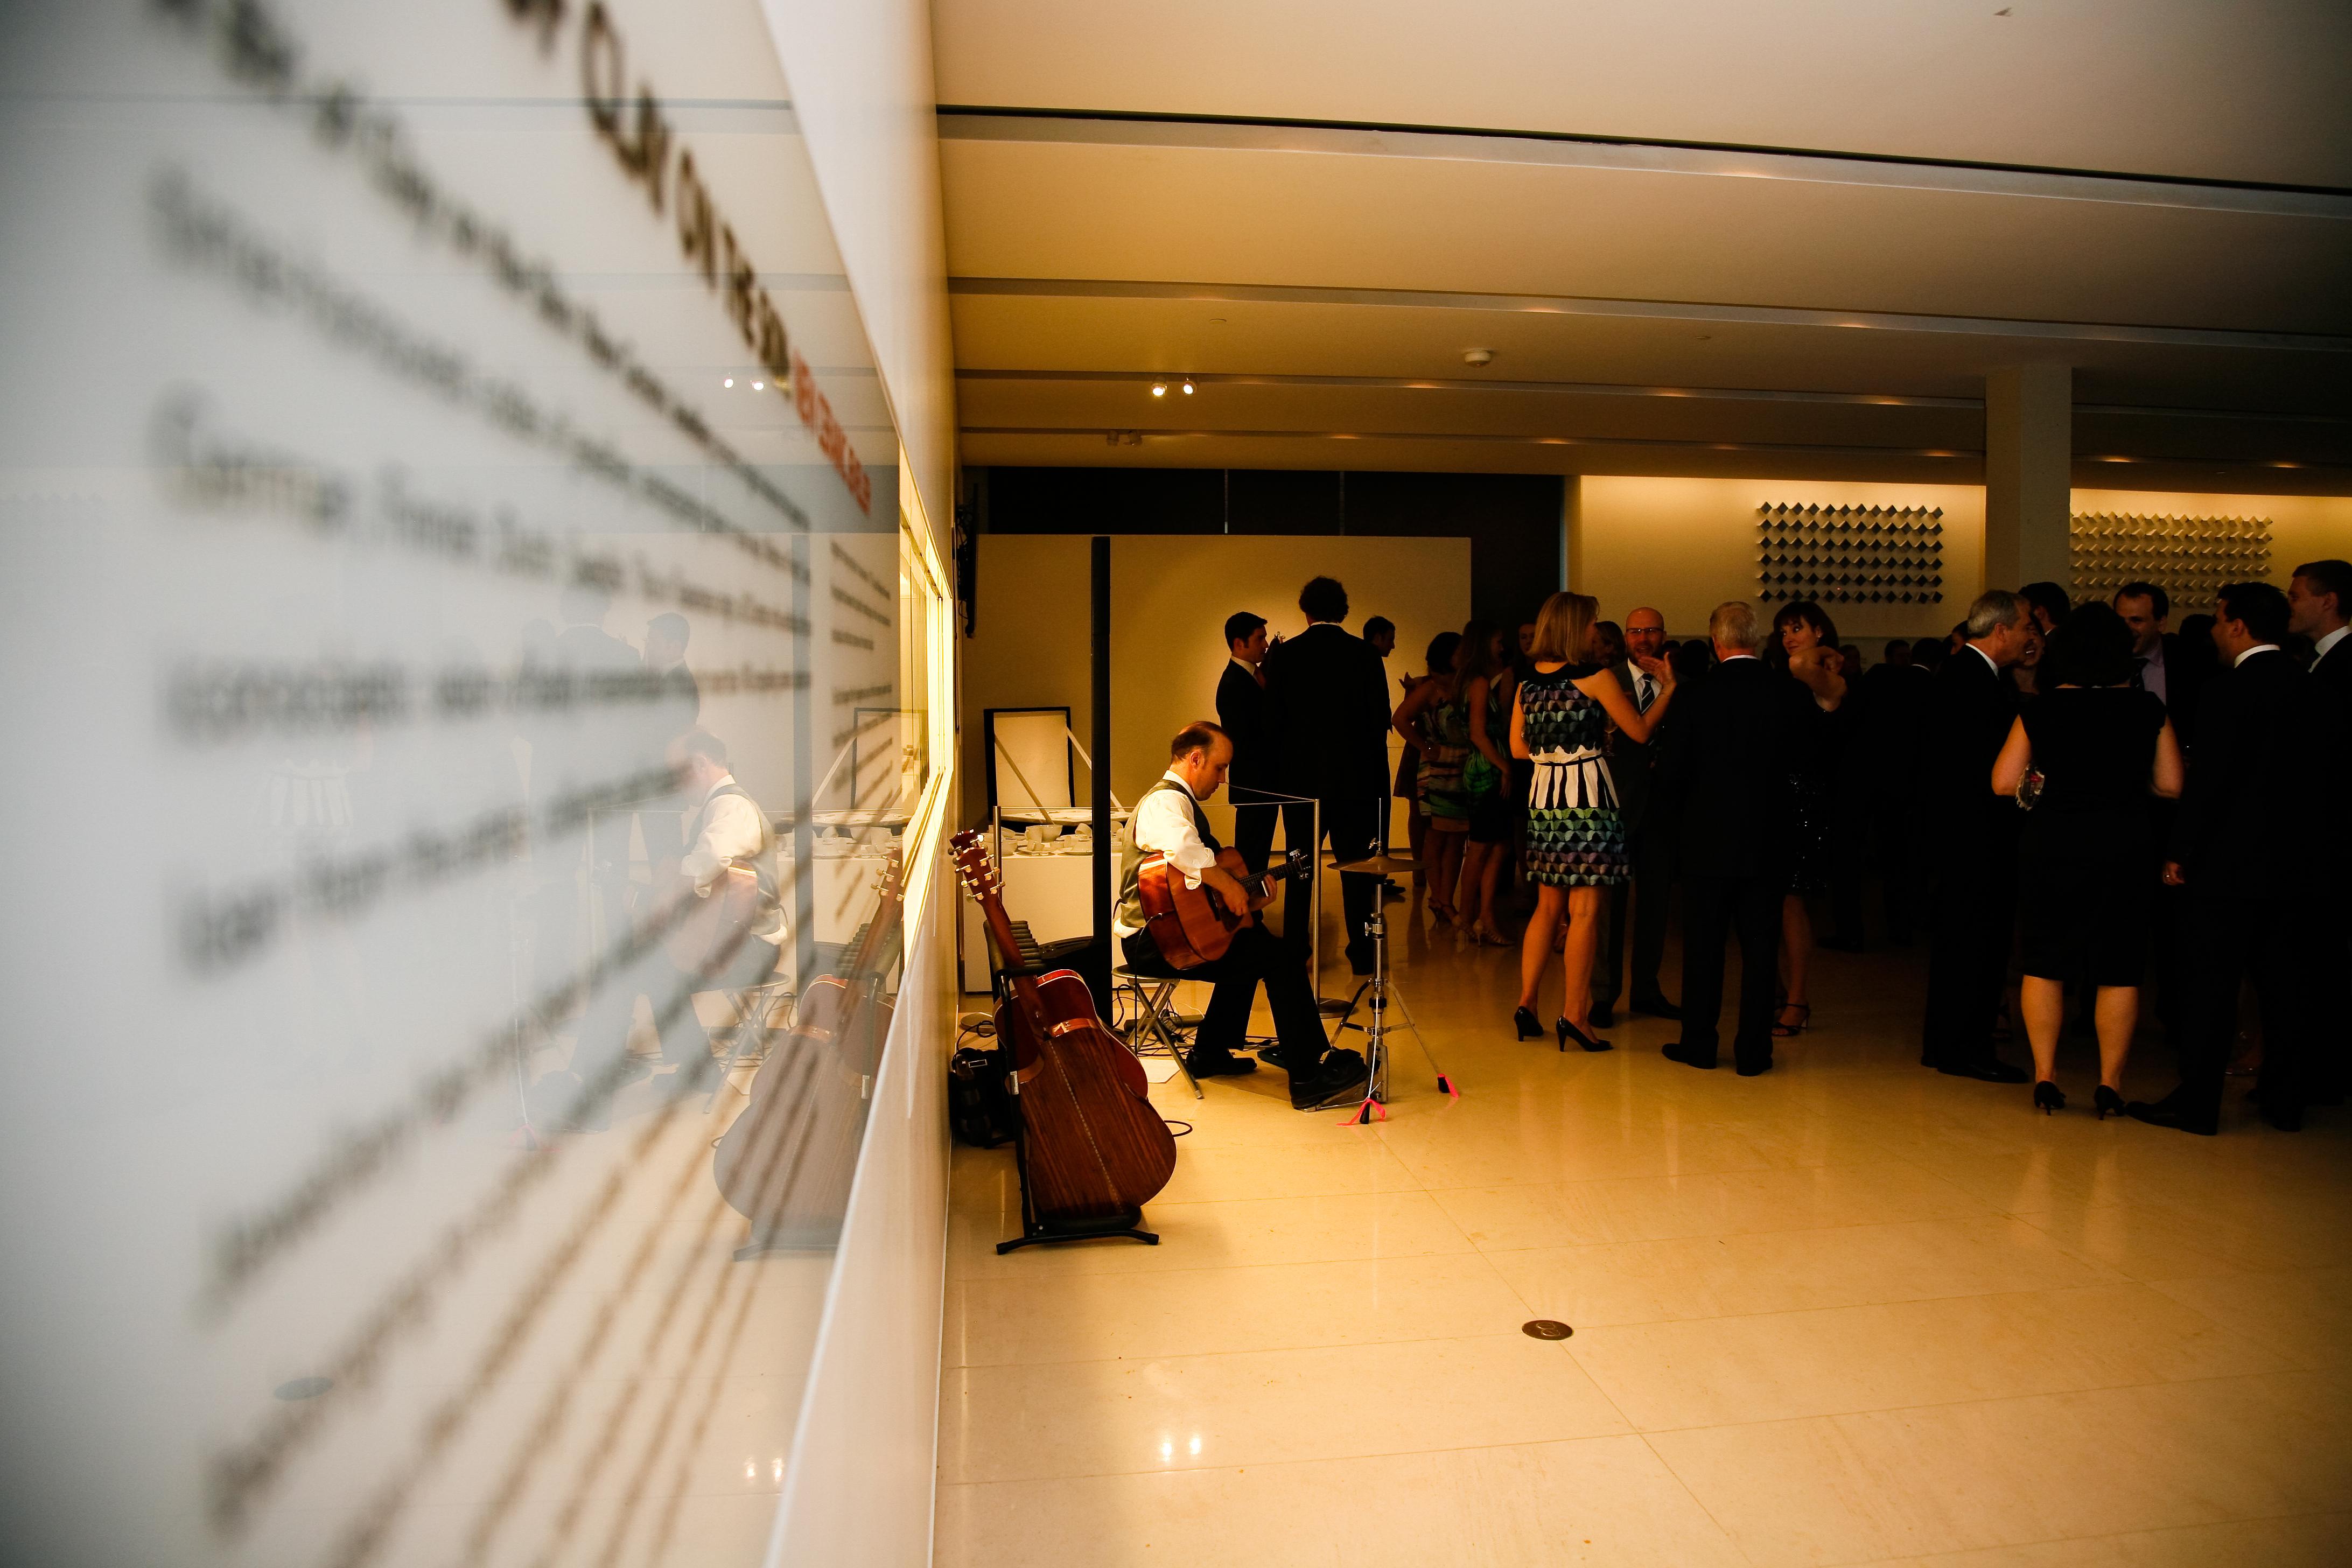 wedding guitarist toronto ottawa niagara new york city naples ceremony guitar